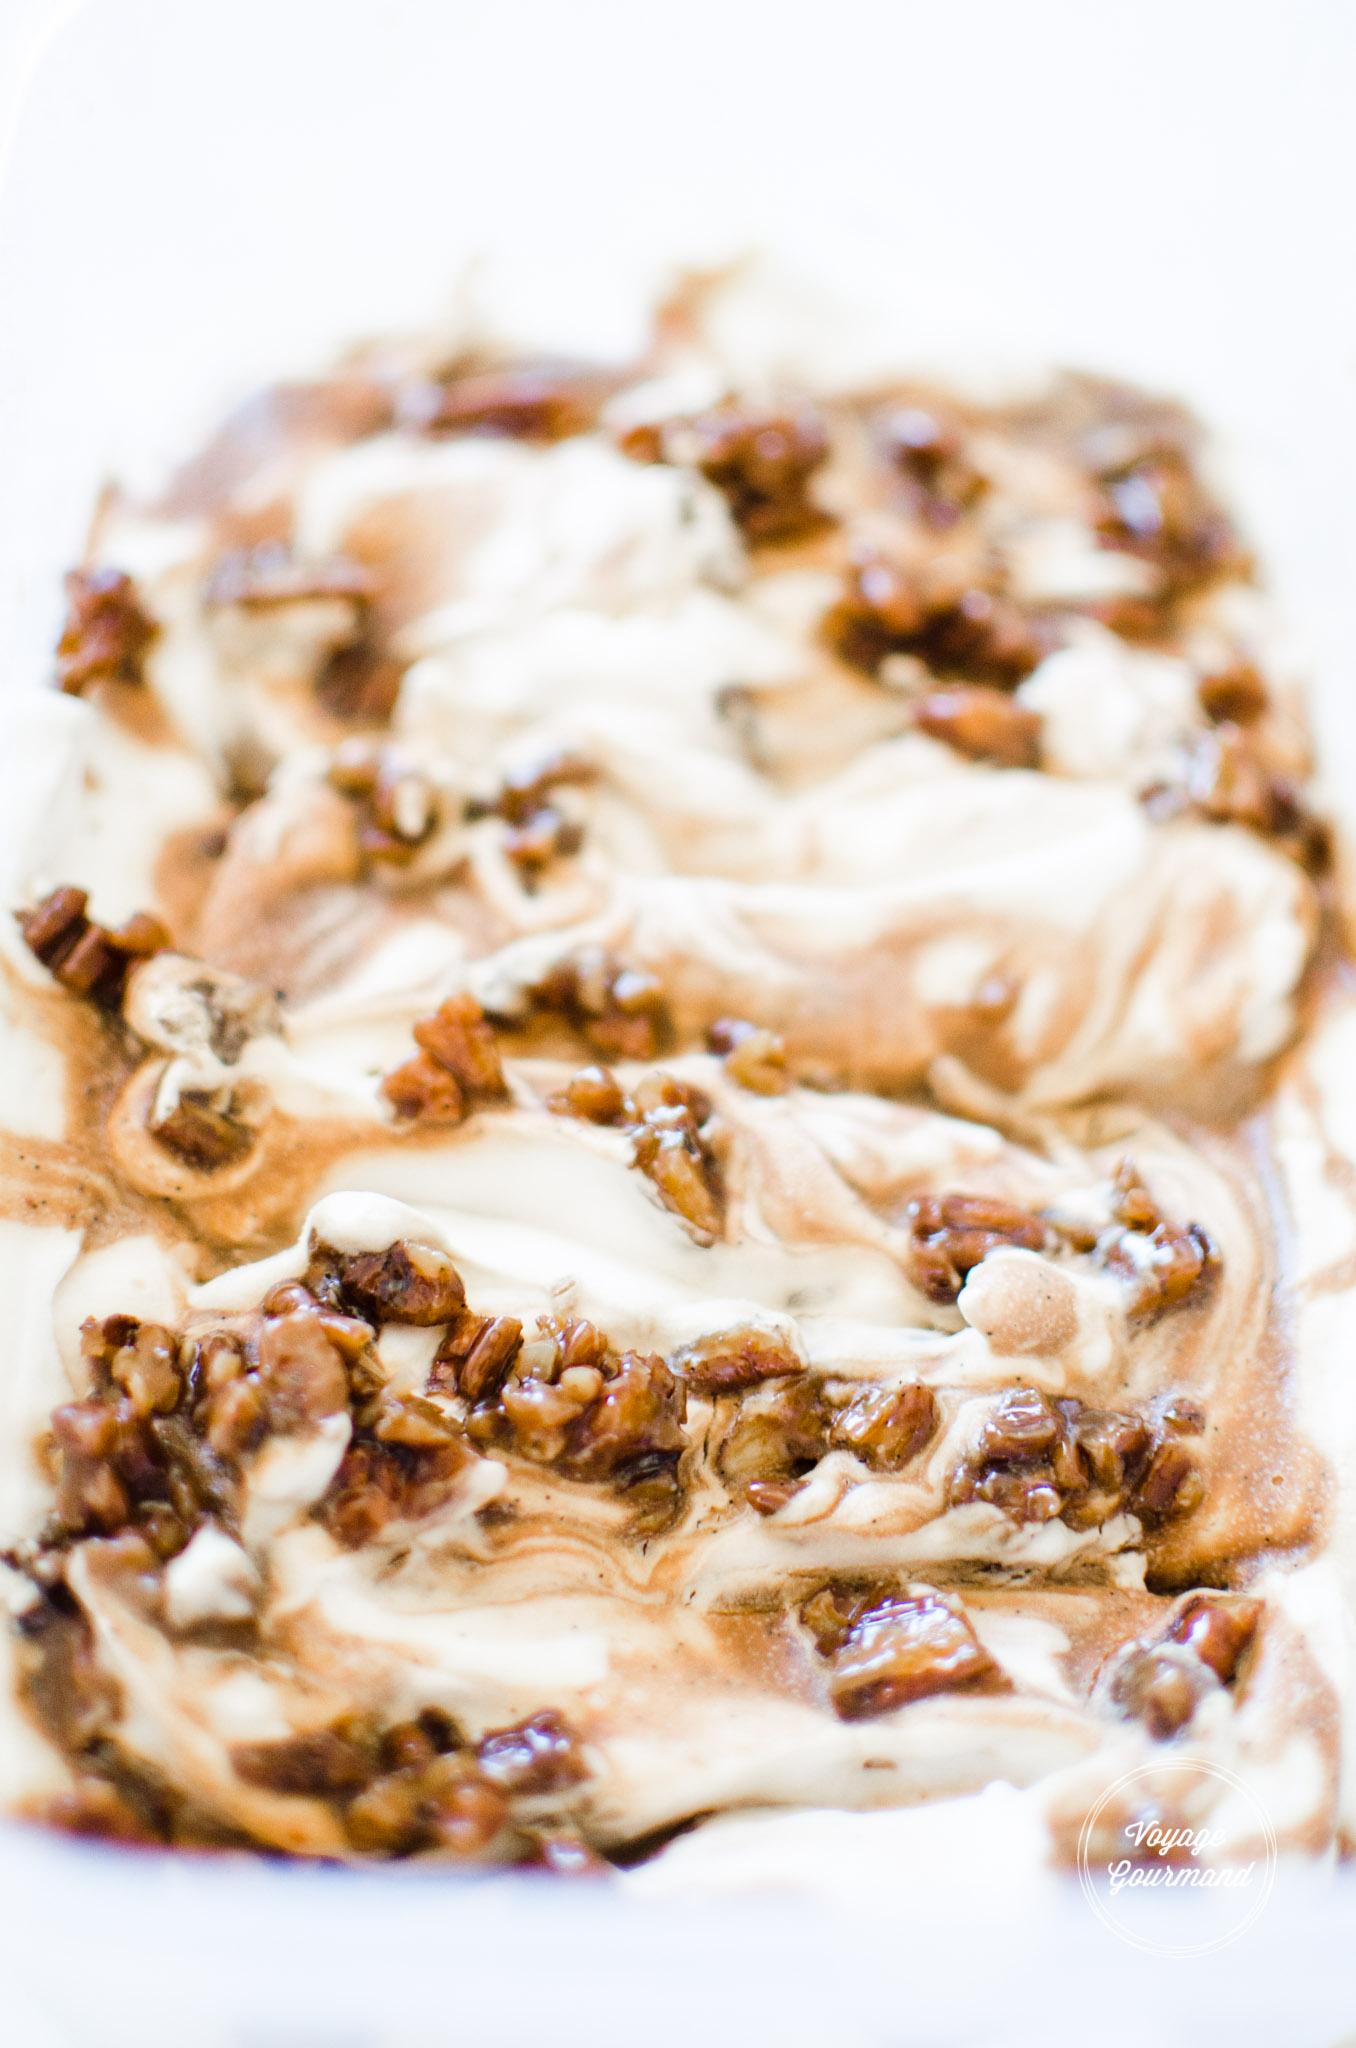 Crème glacée coco-vanille-caramel-pécan